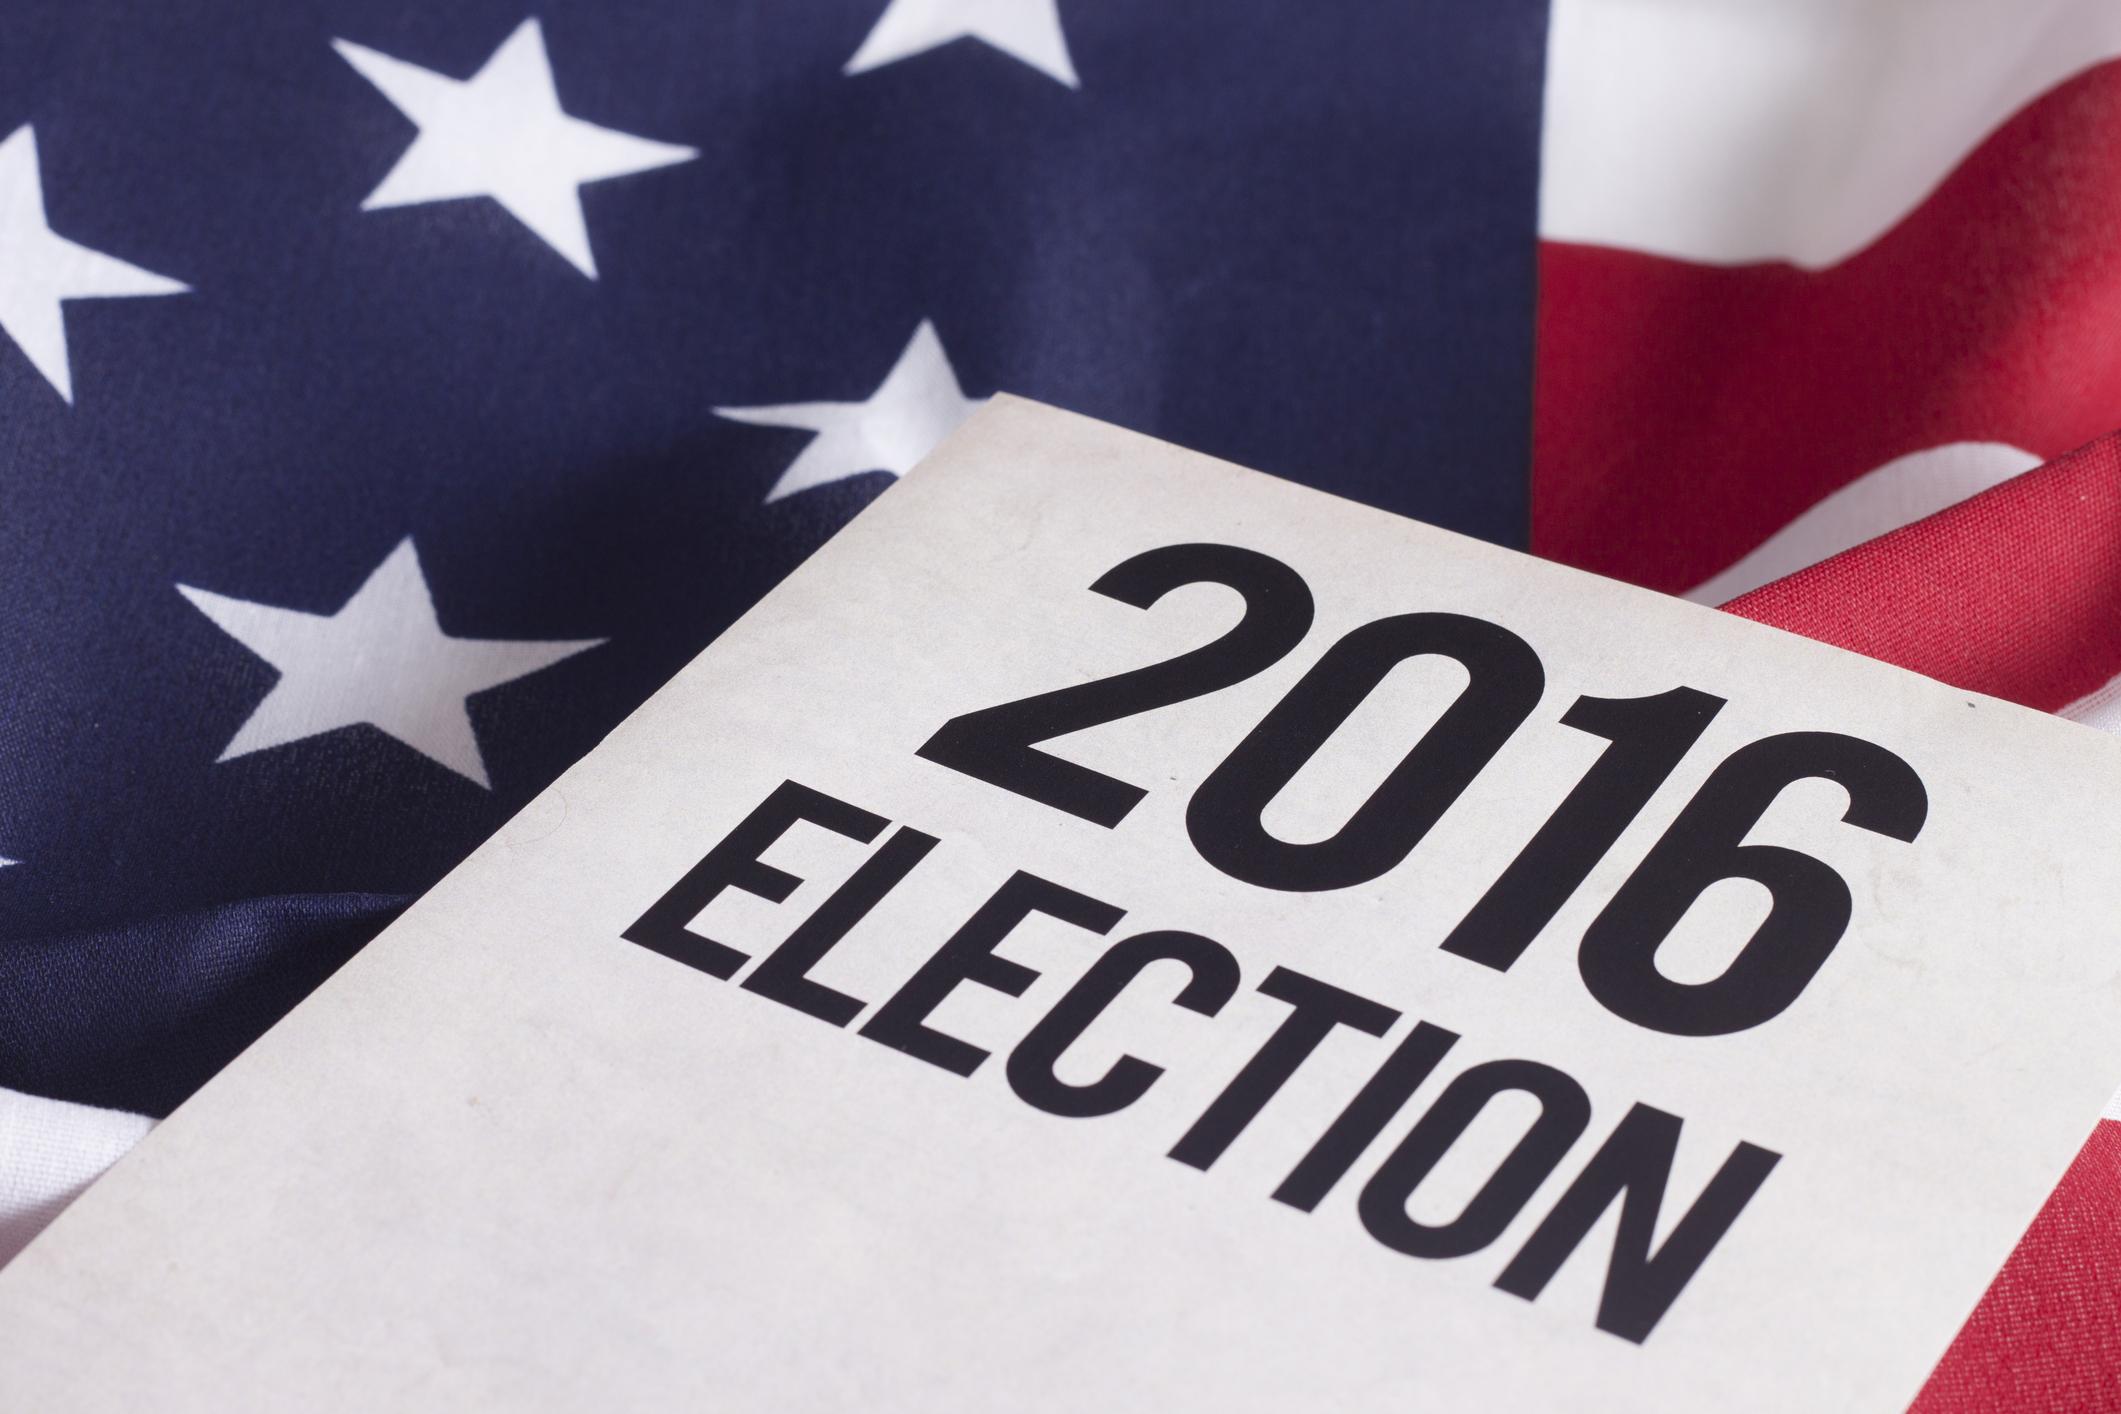 Rowan County, N.C. Primary Elections Results | Rowan Free Press